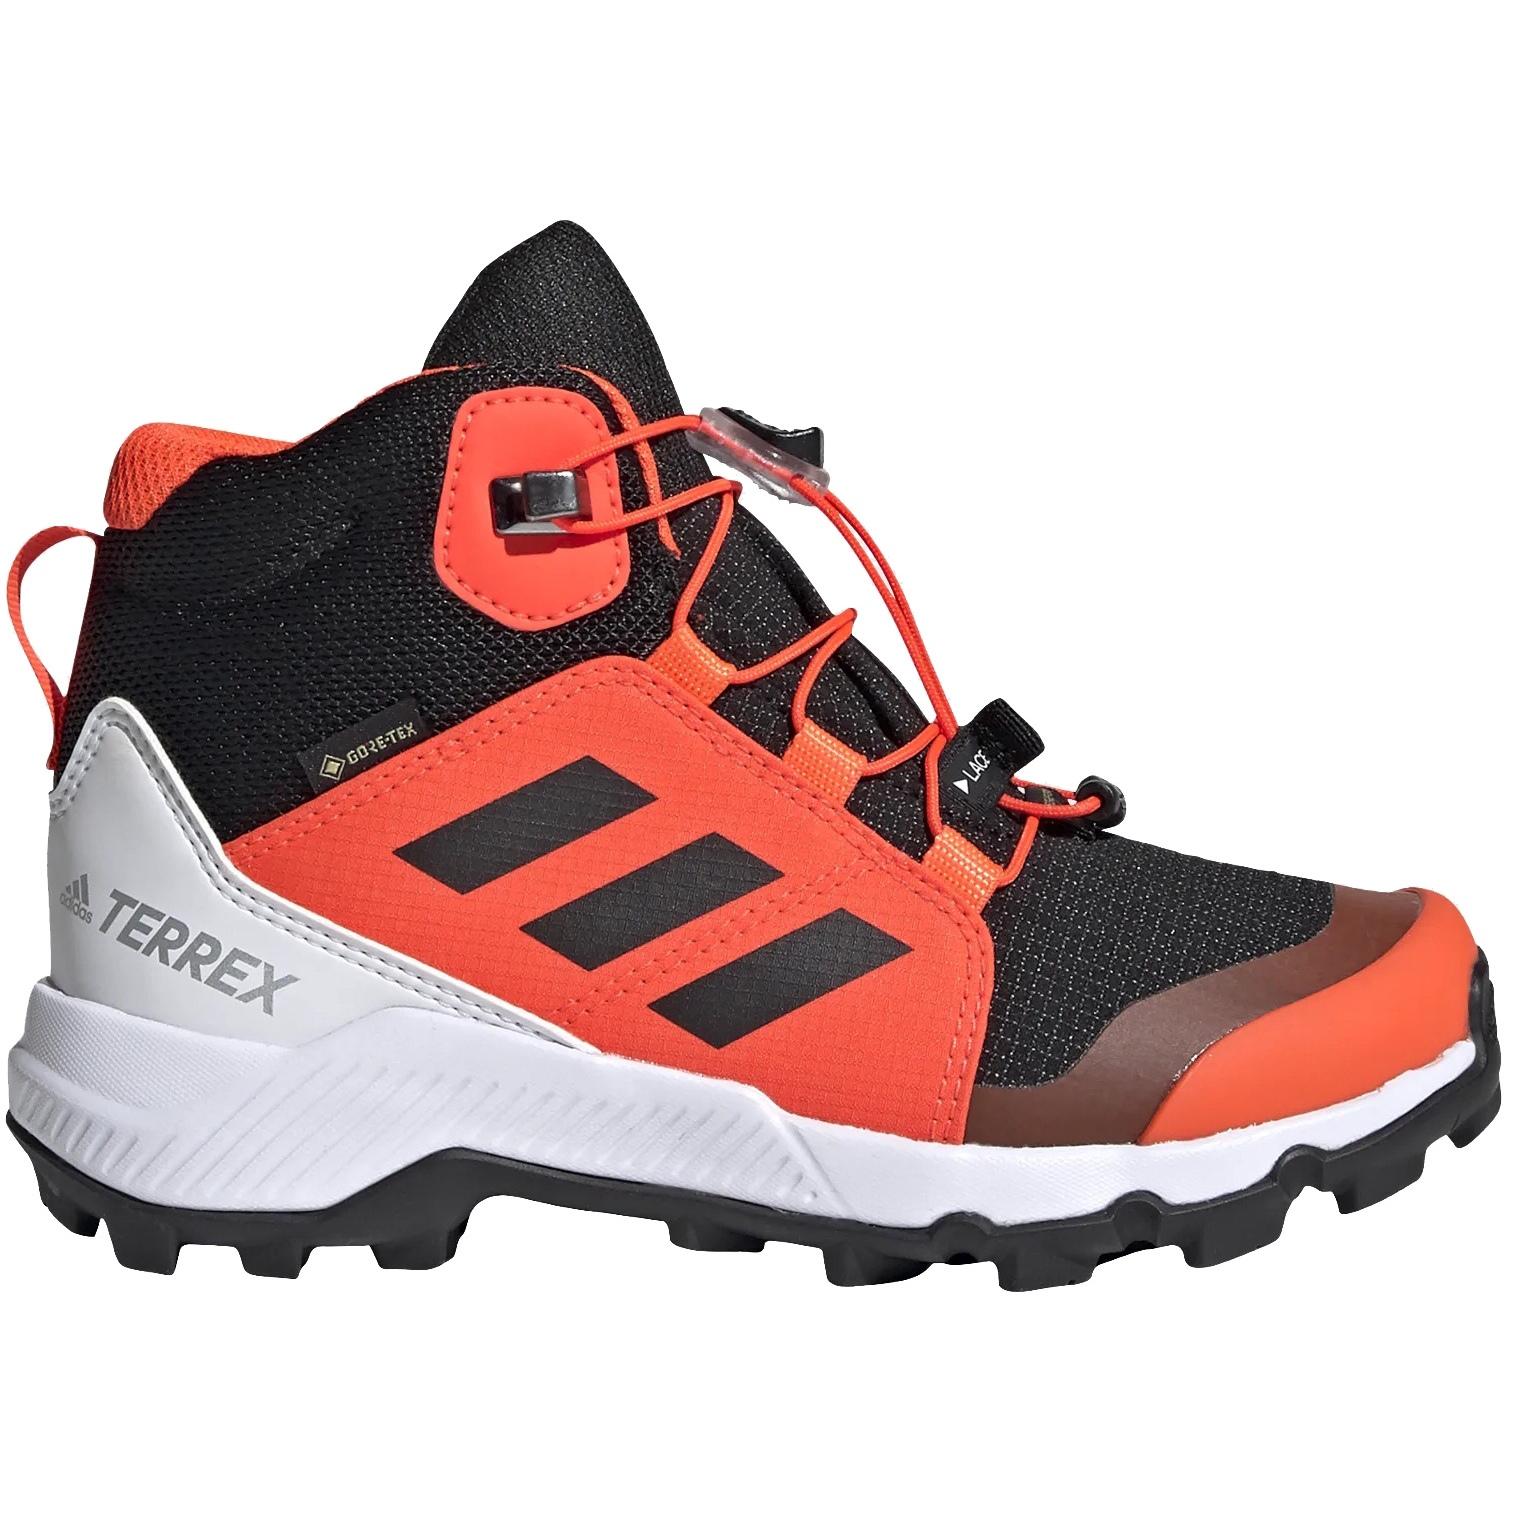 adidas Kinder TERREX Mid GORE-TEX Wanderschuhe - core black/core black/solar red FW9757